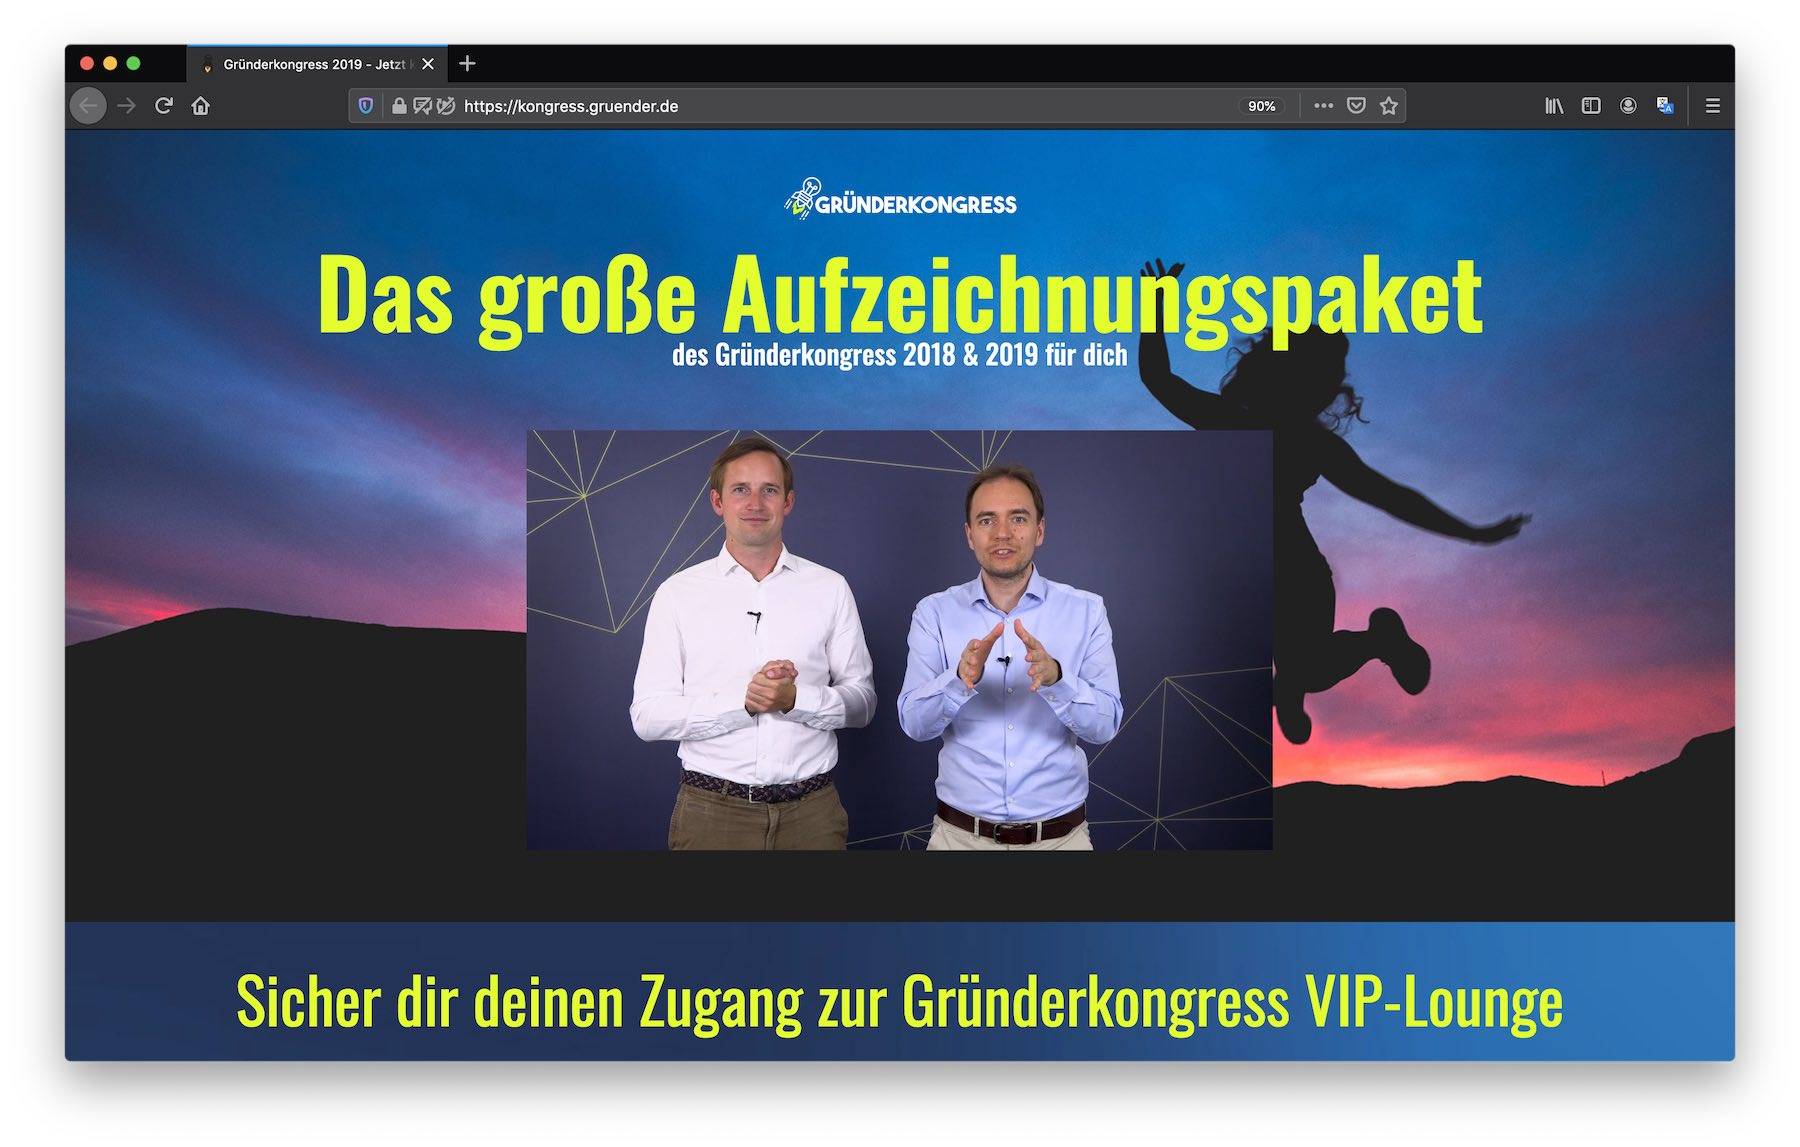 gruenderkongress-live-stream-event